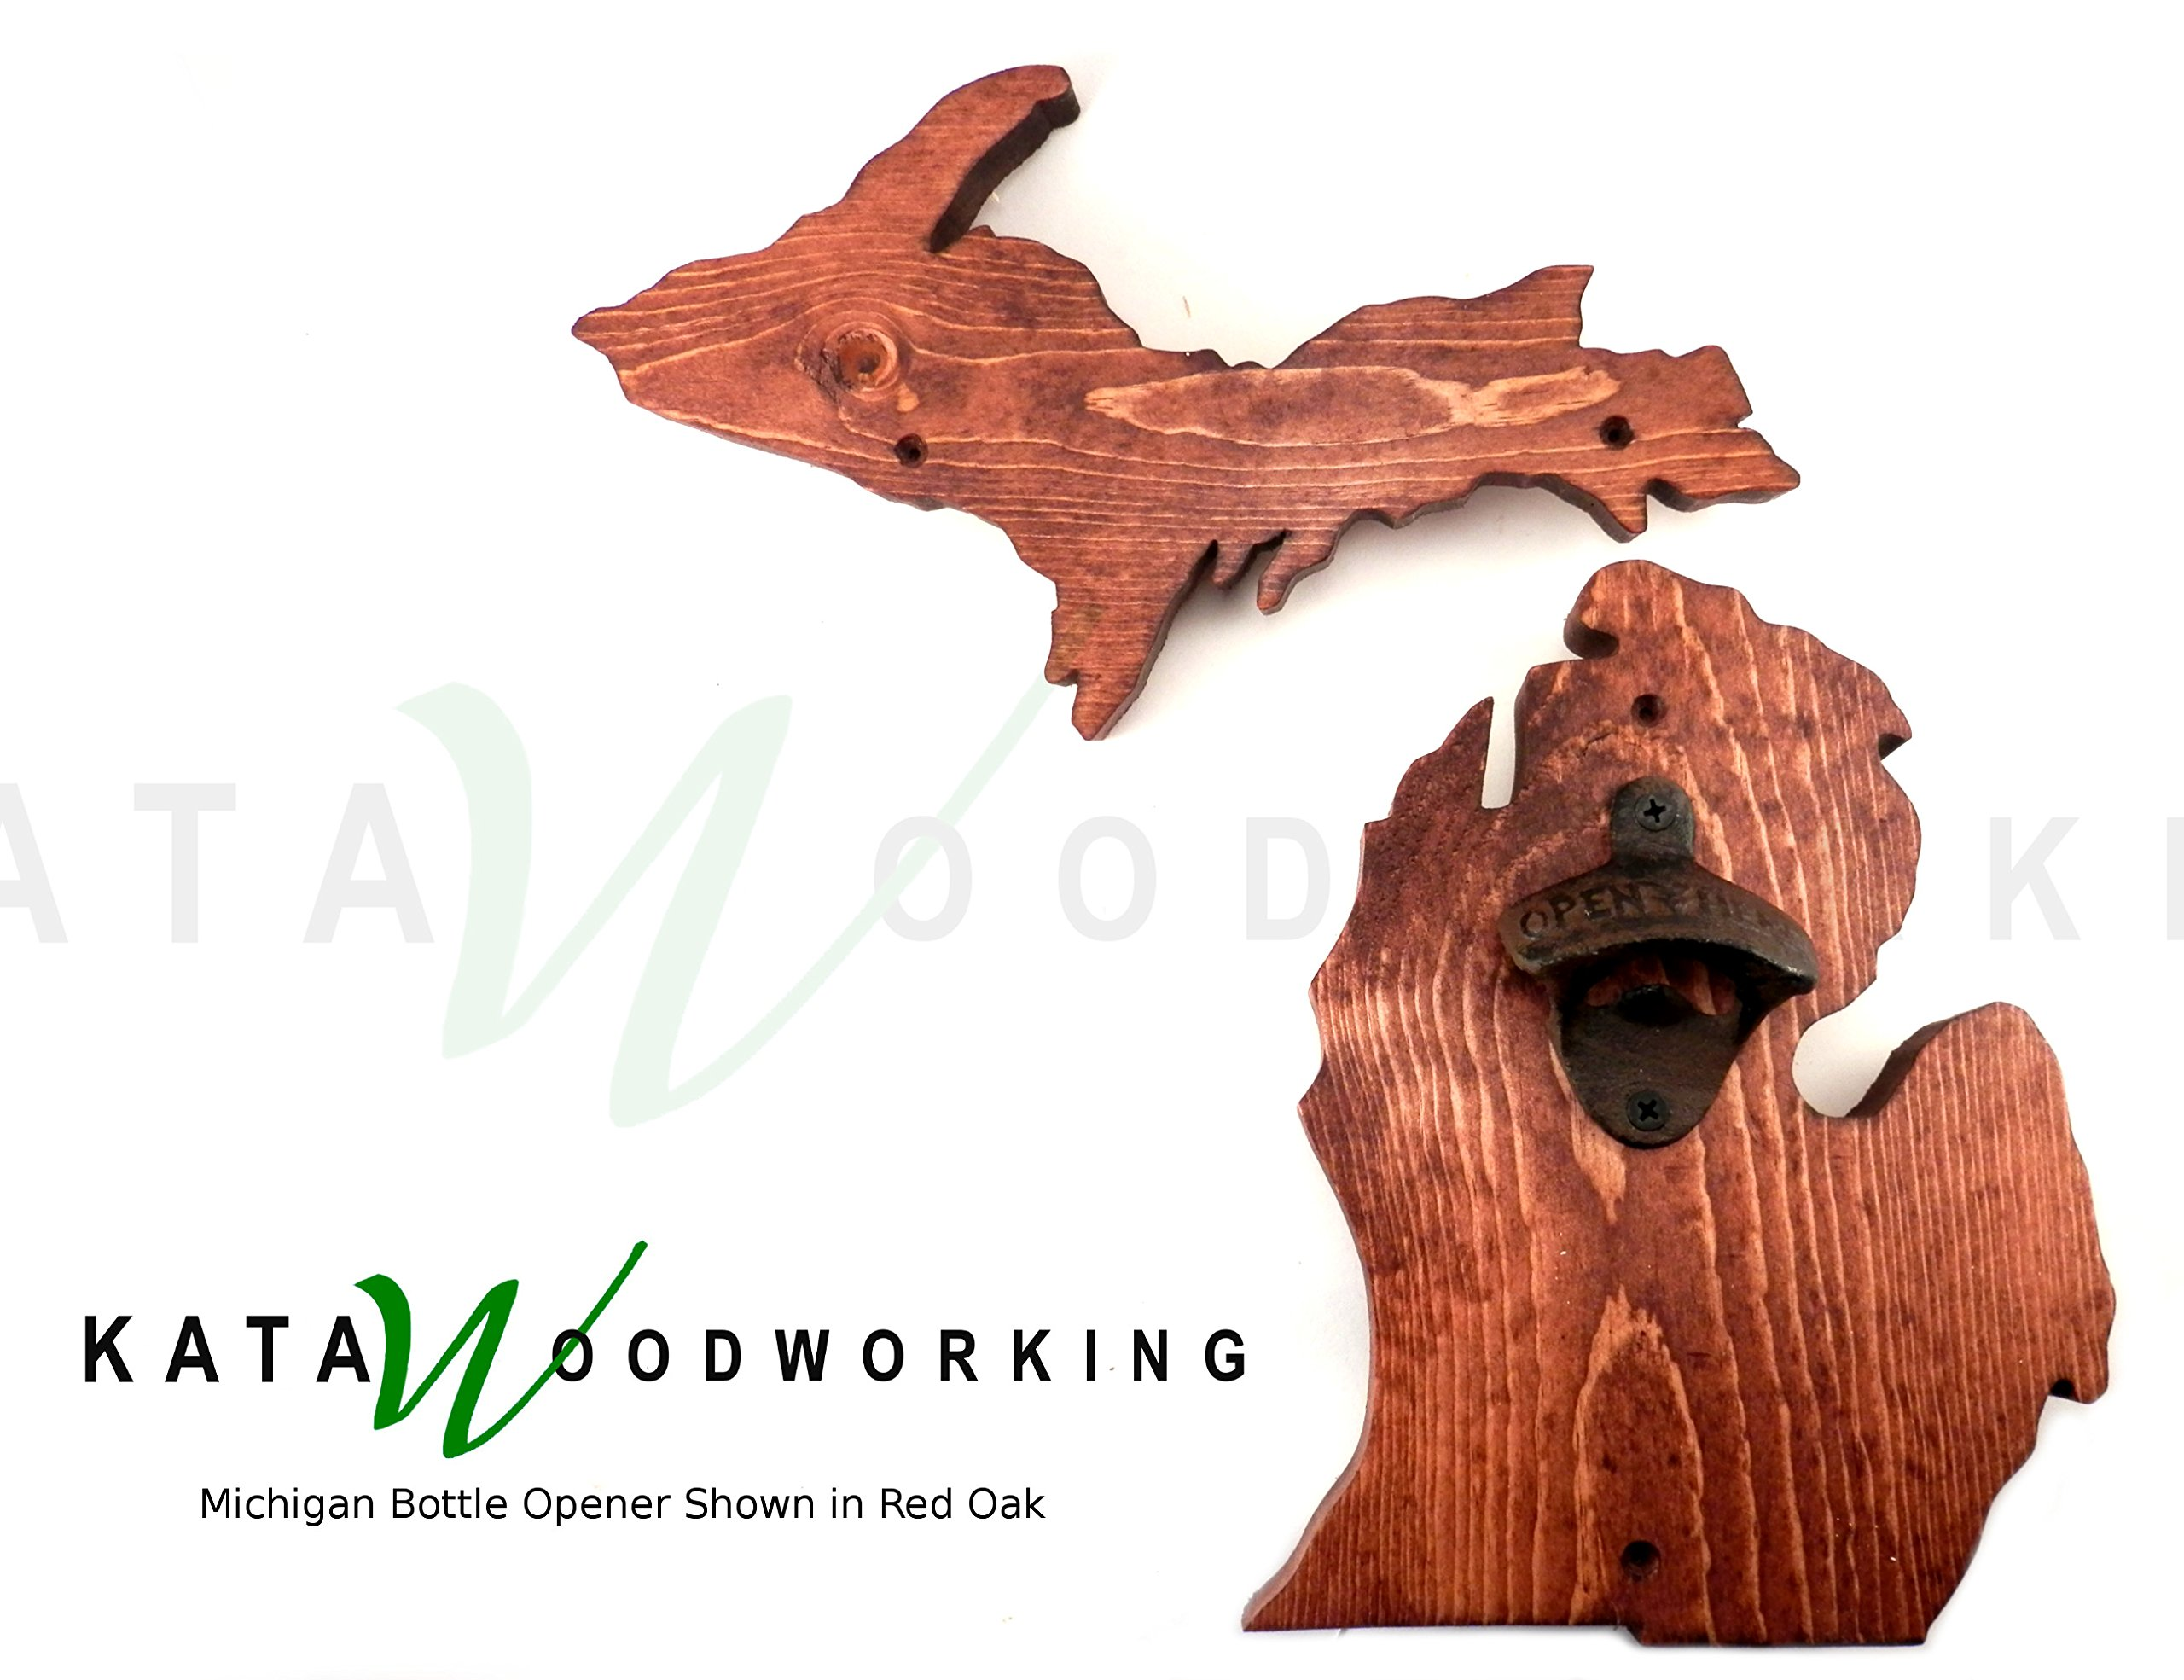 Michigan Upper & Lower Peninsula Shaped Wood Cut-out Bottle Opener - Wall Mount - Handmade by Kata Woodworking (Image #1)